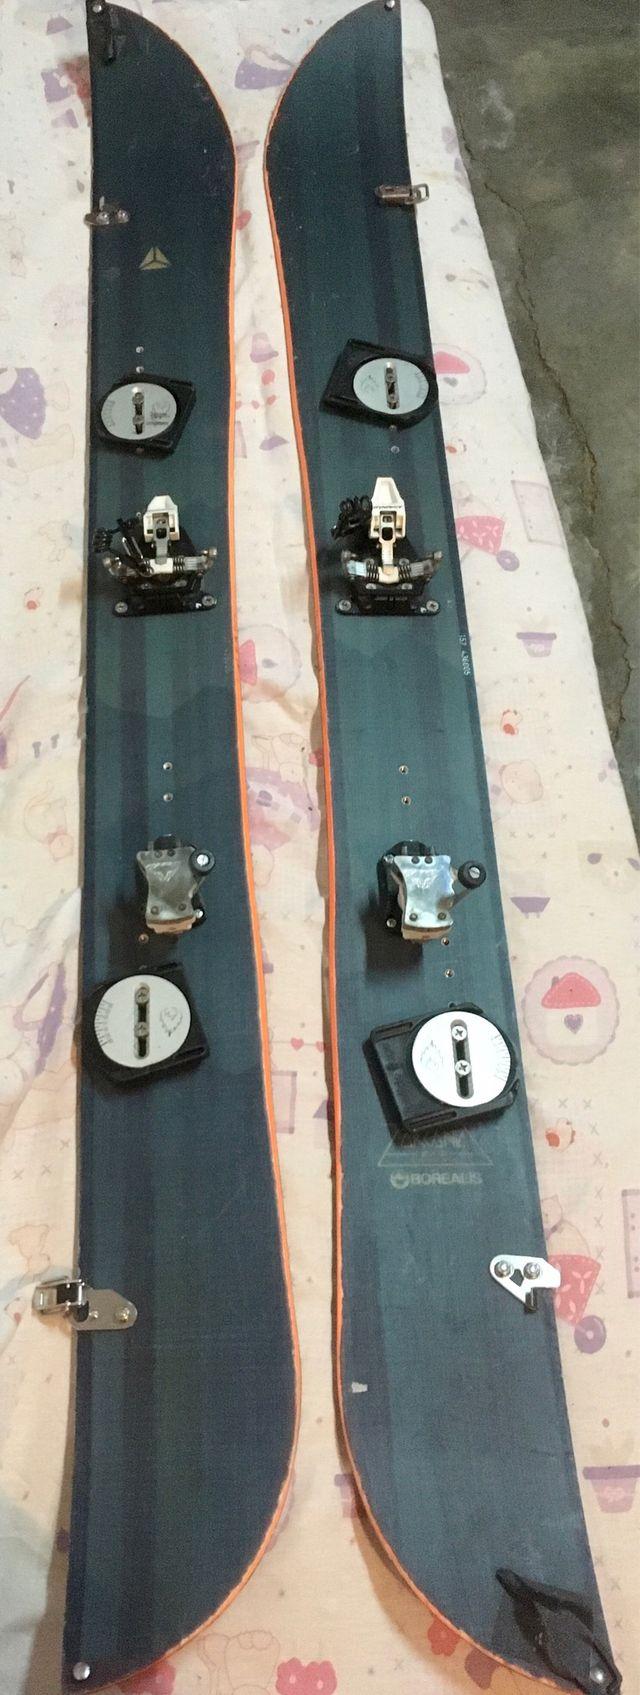 Splitboard 157